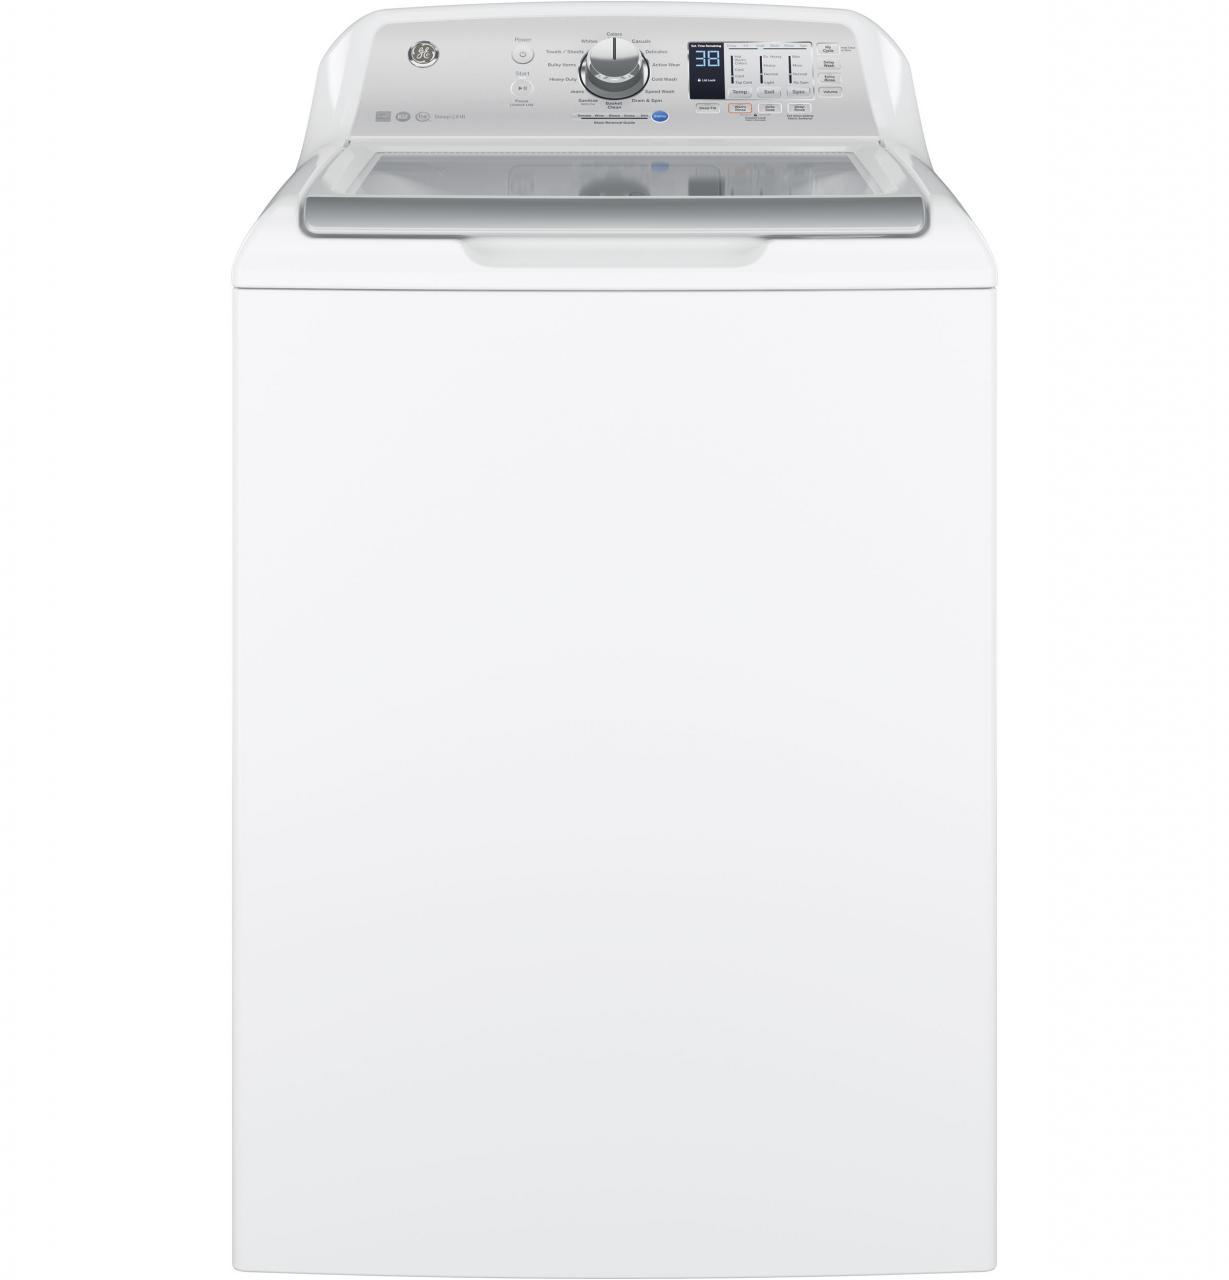 Slager Appliances - Home Appliances, Kitchen Appliances in Iowa City ...